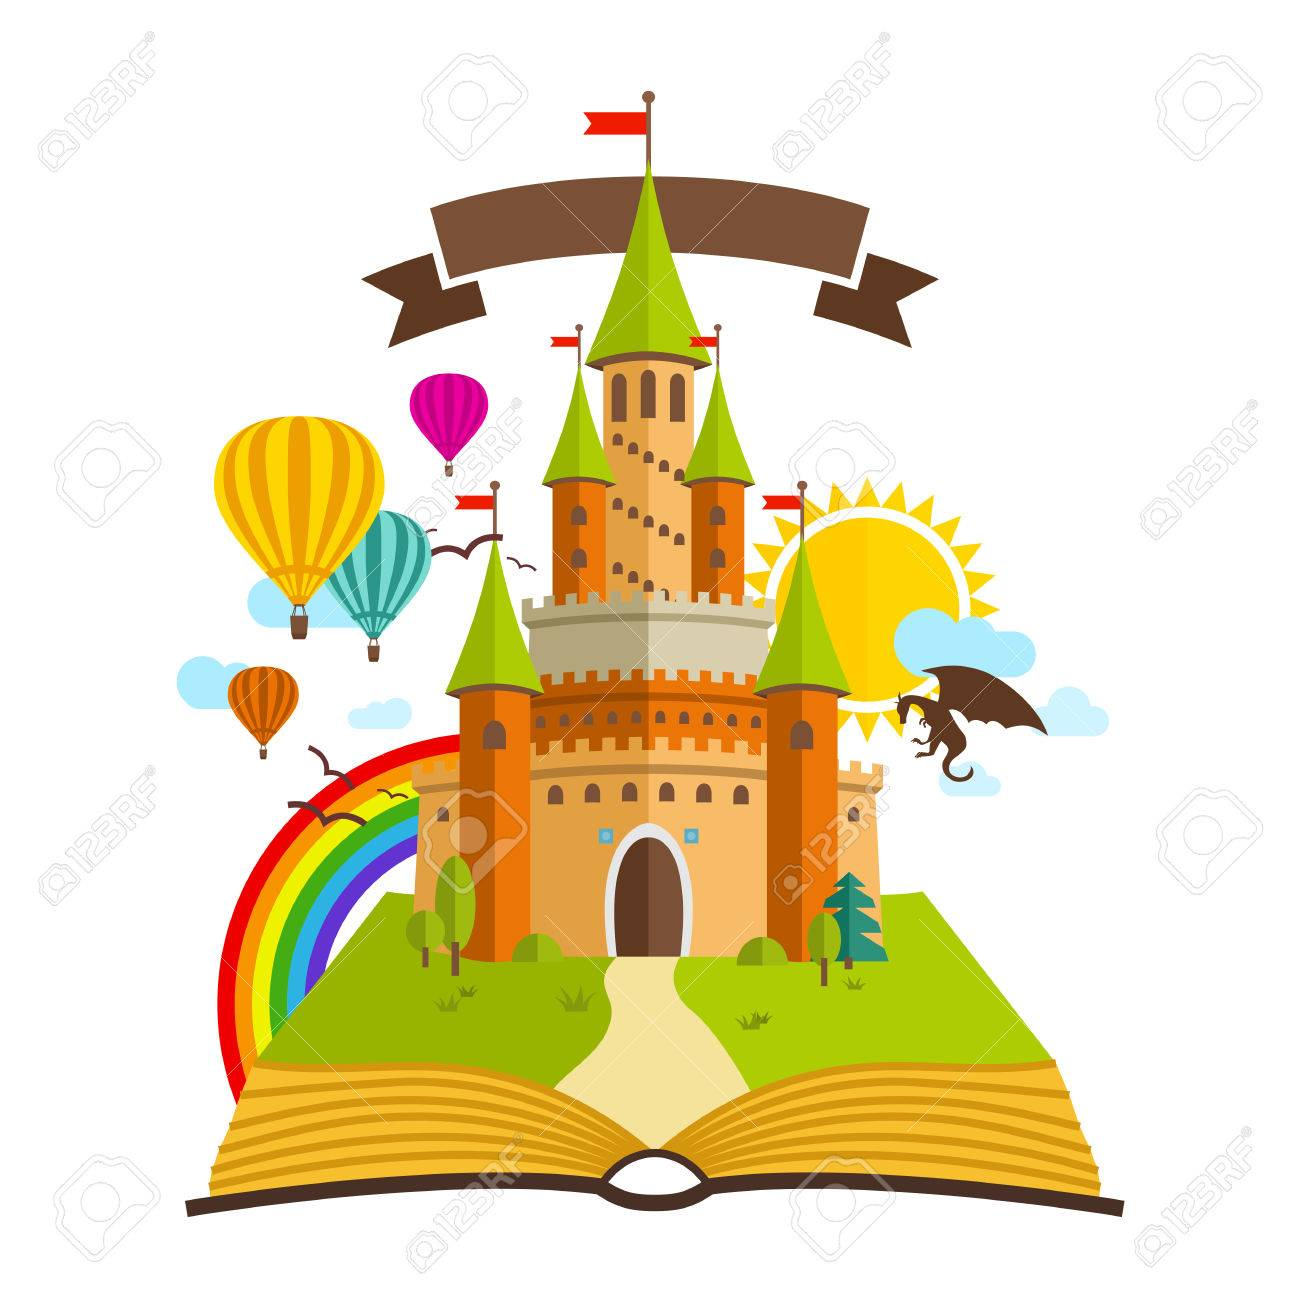 Clipart fairy tale free stock Free Fairytale Clipart fairy tale book, Download Free Clip Art on ... free stock